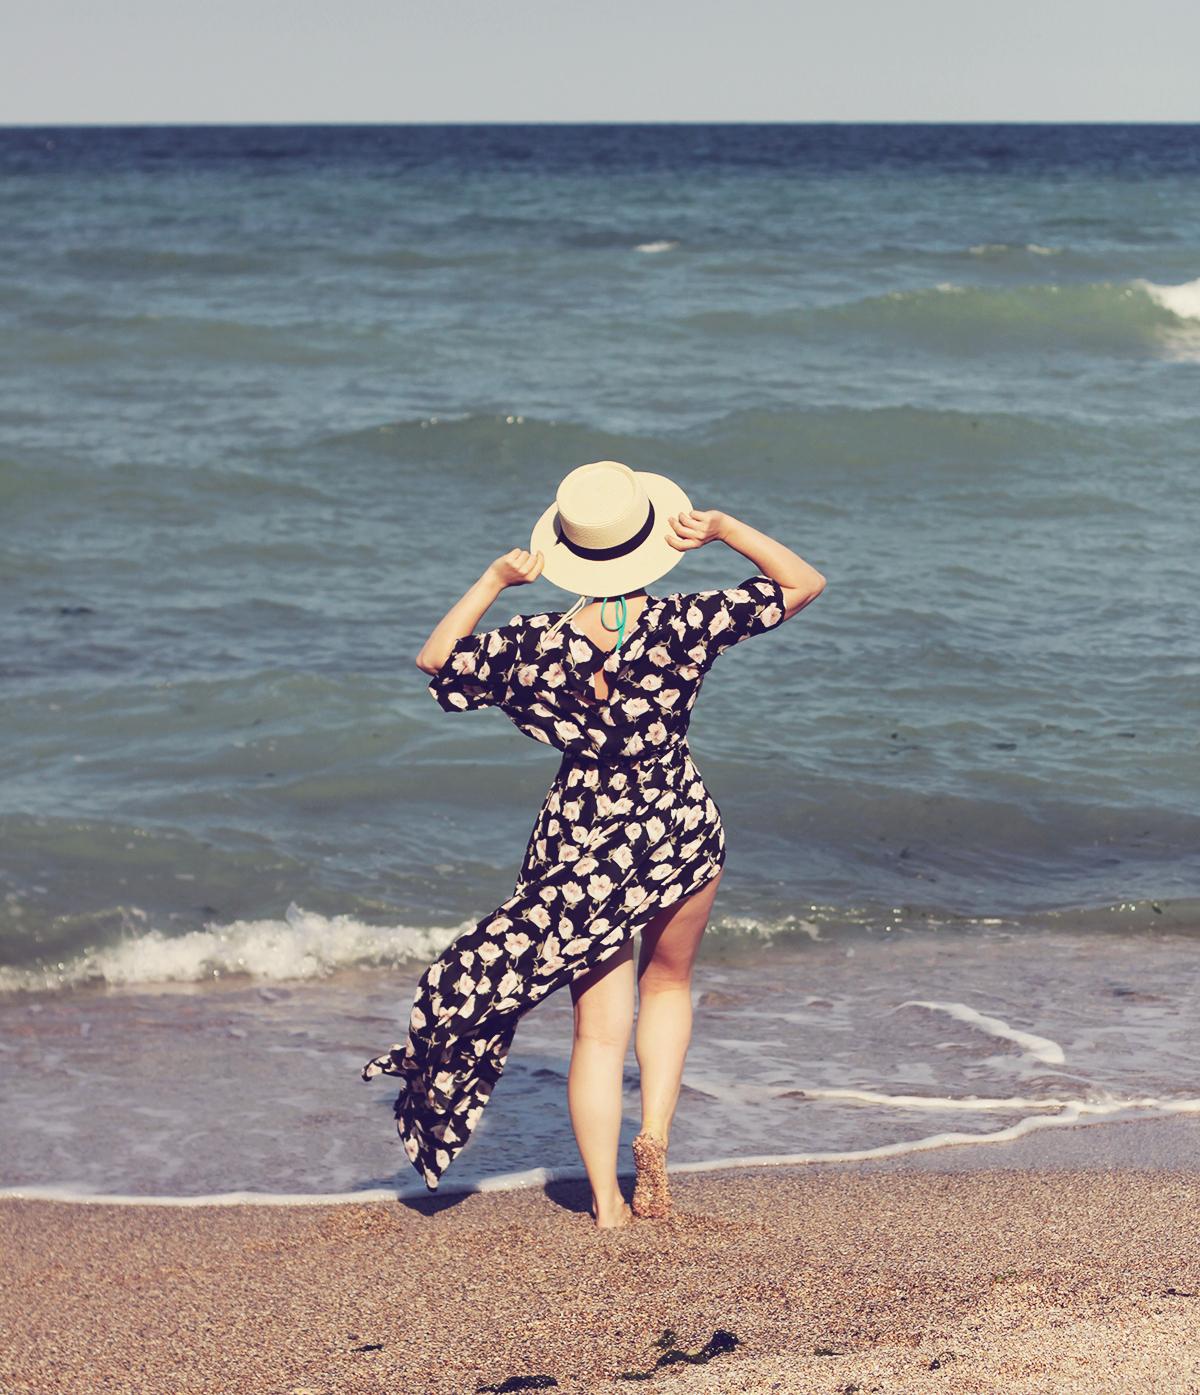 zaful floral print maxi dress, straw hat, beachside